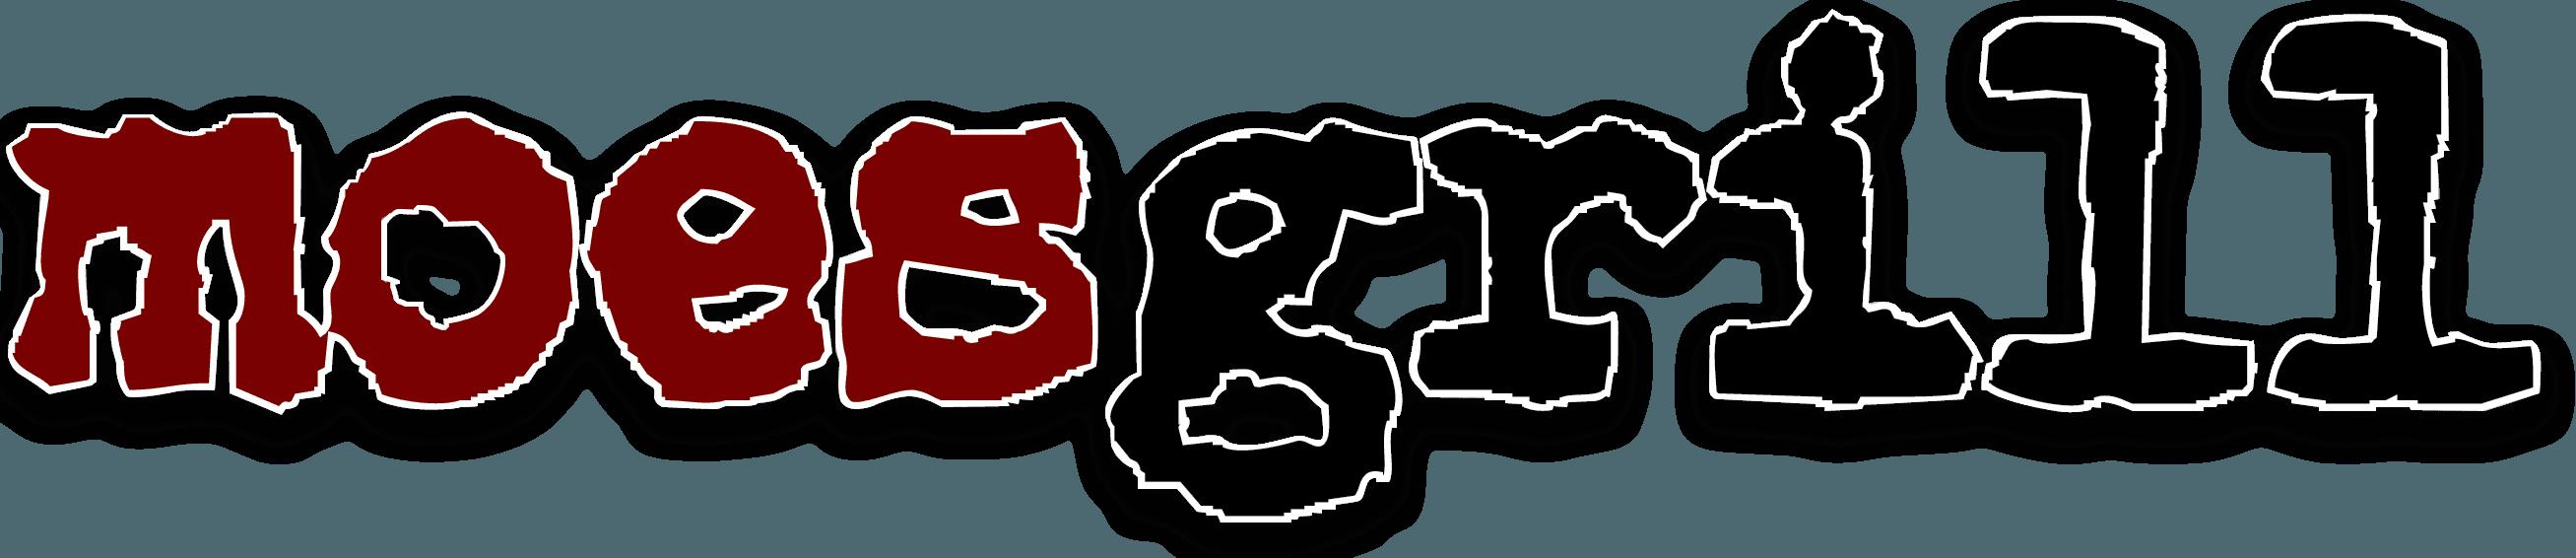 Redz Bar & Grill company logo